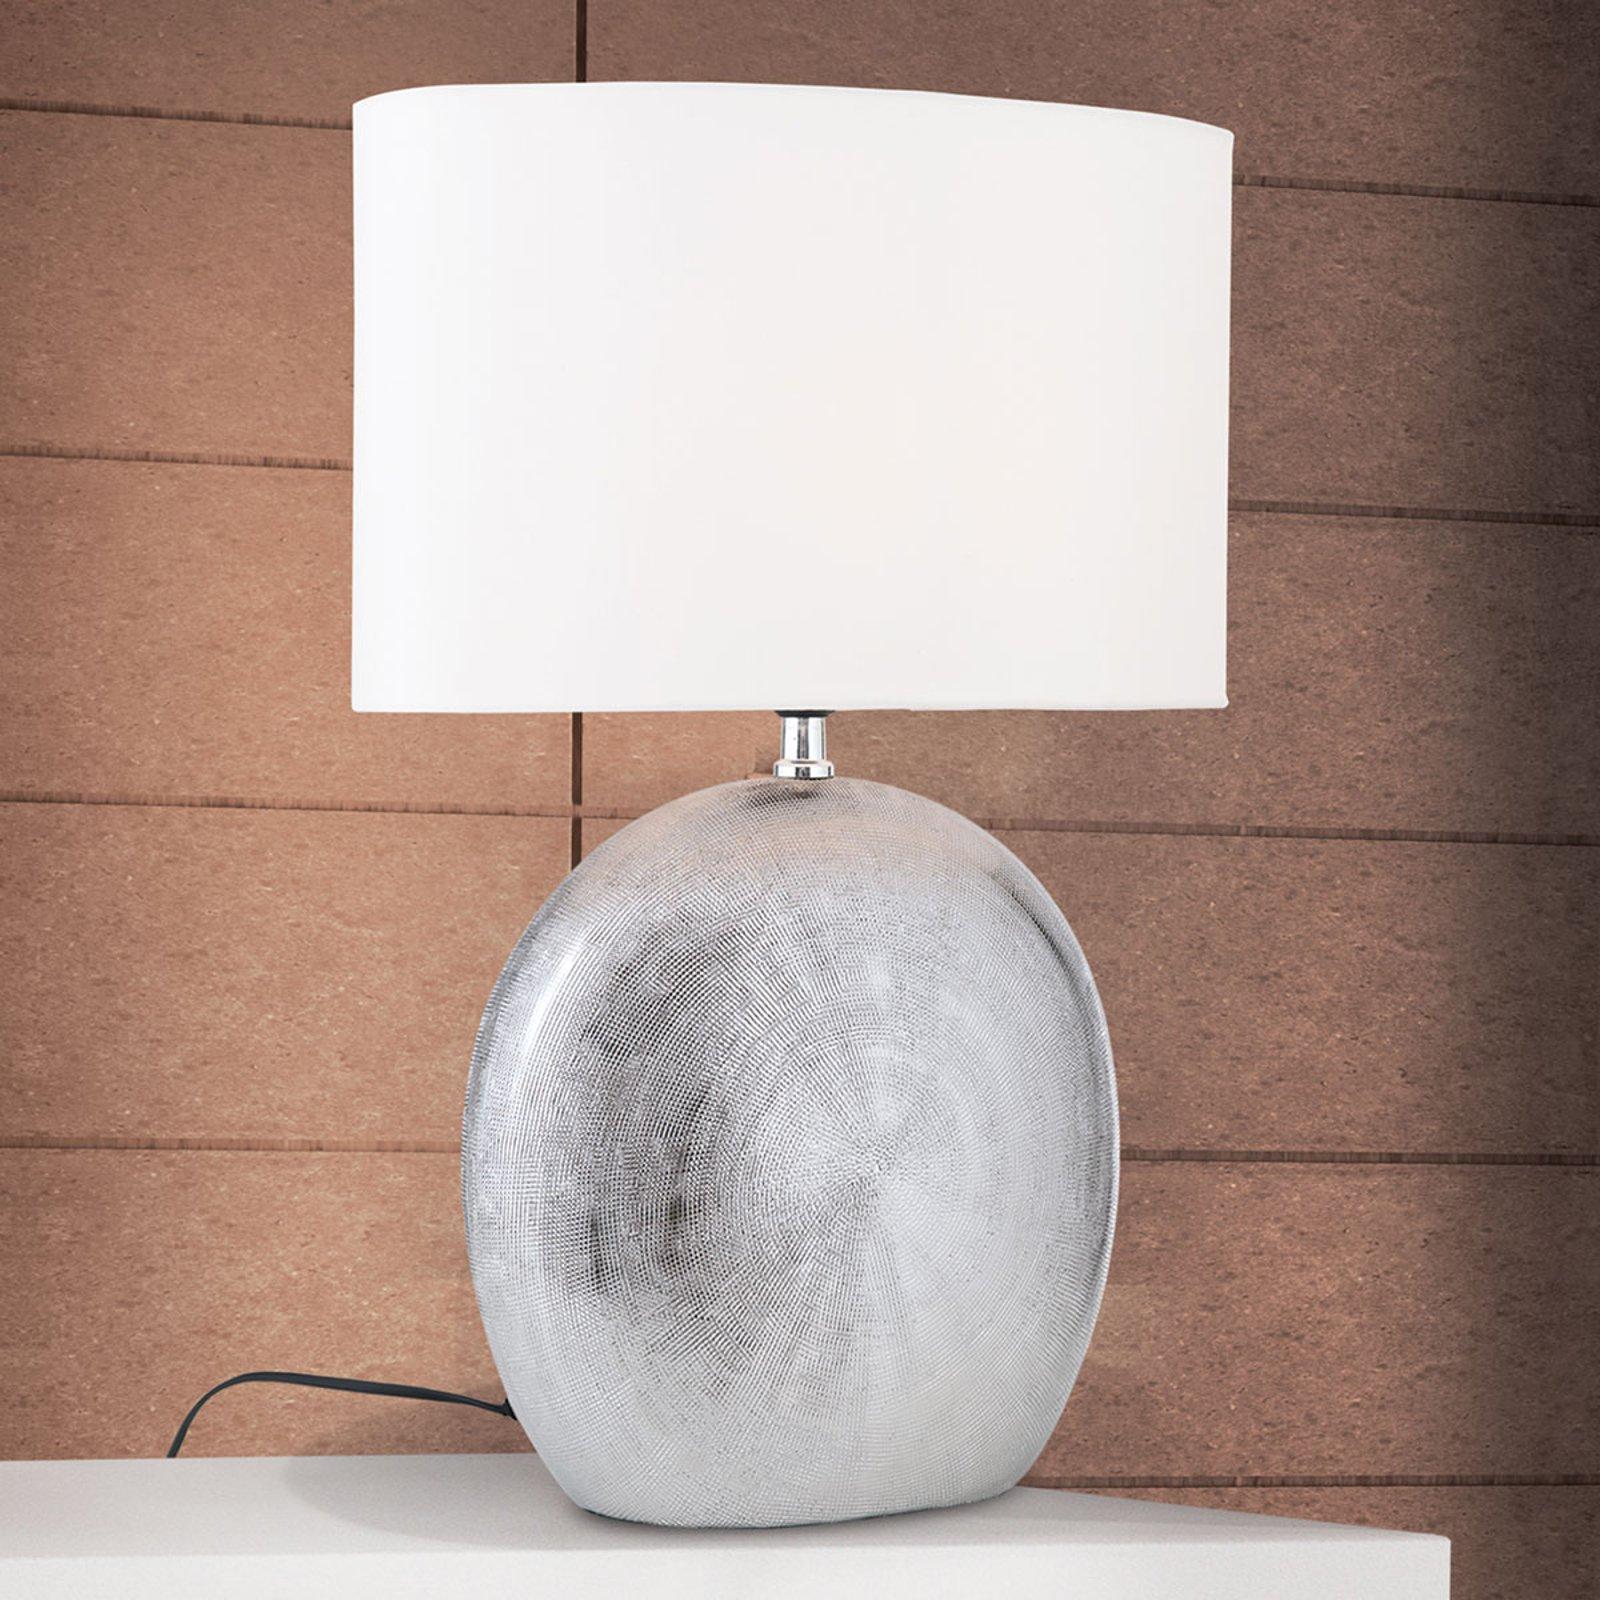 Keramisk bordlampe Ethno 52 cm hvit, fot titan